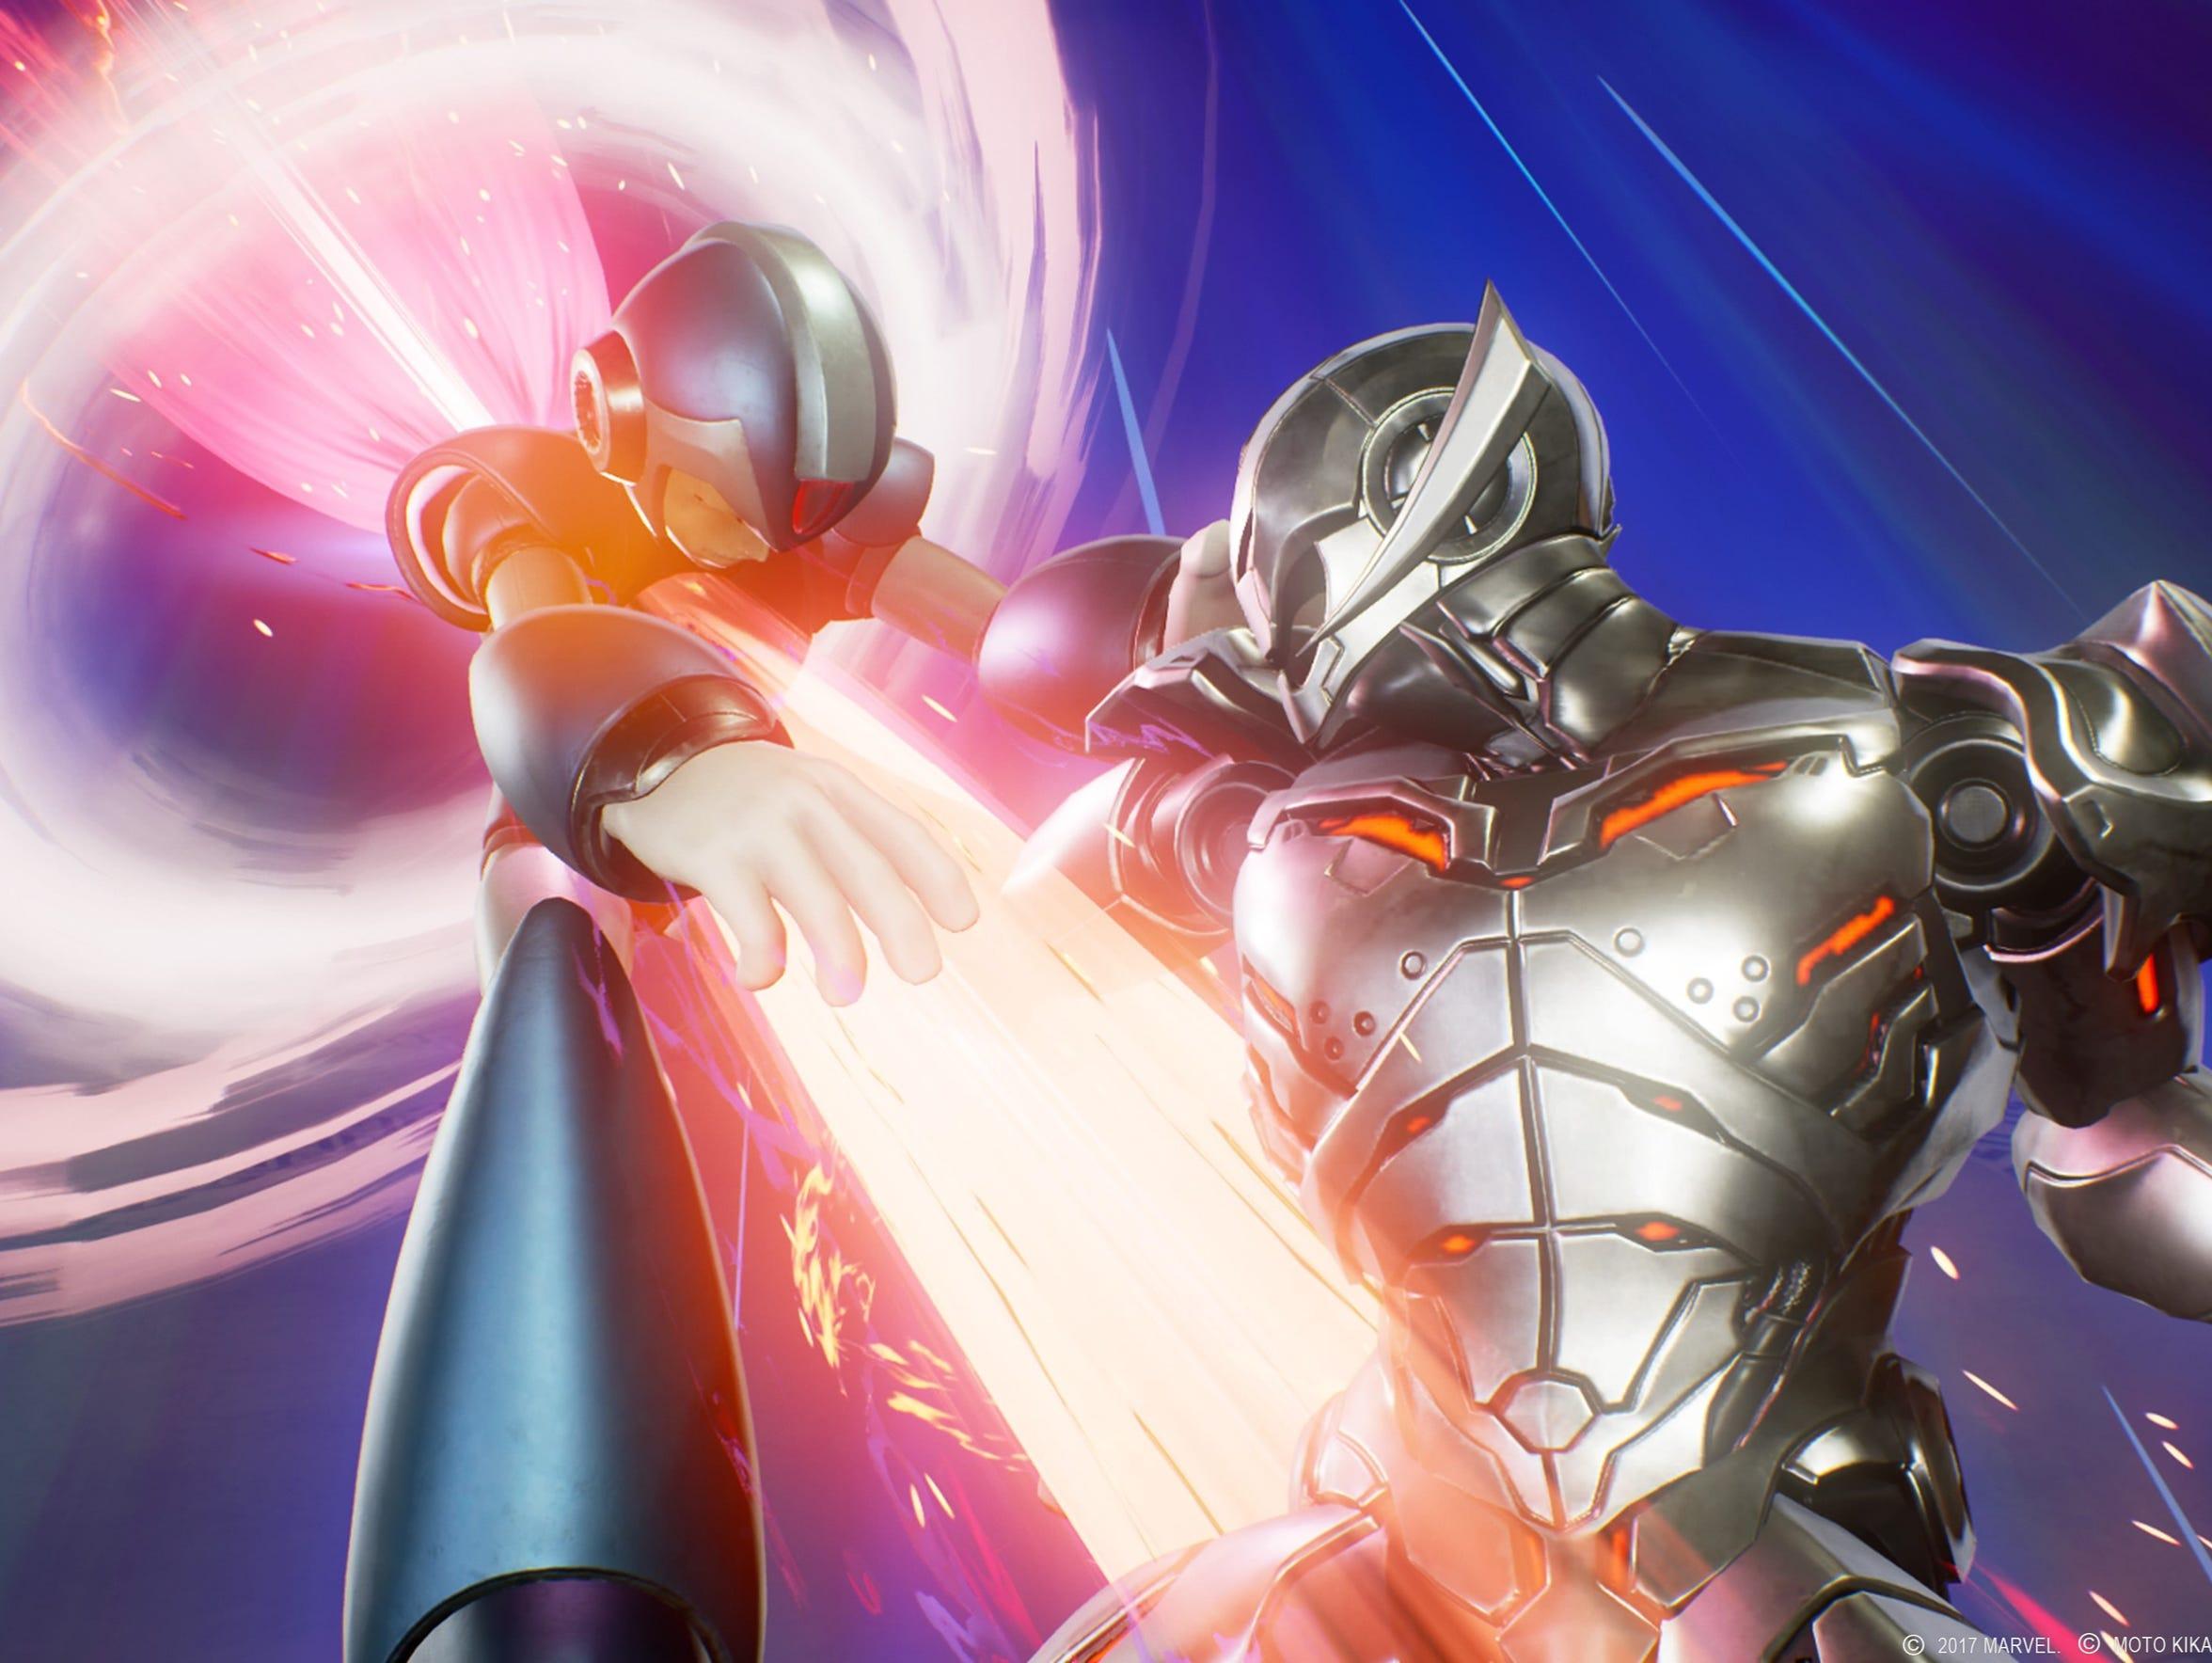 The Marvel vs. Capcom: Infinite universe continues